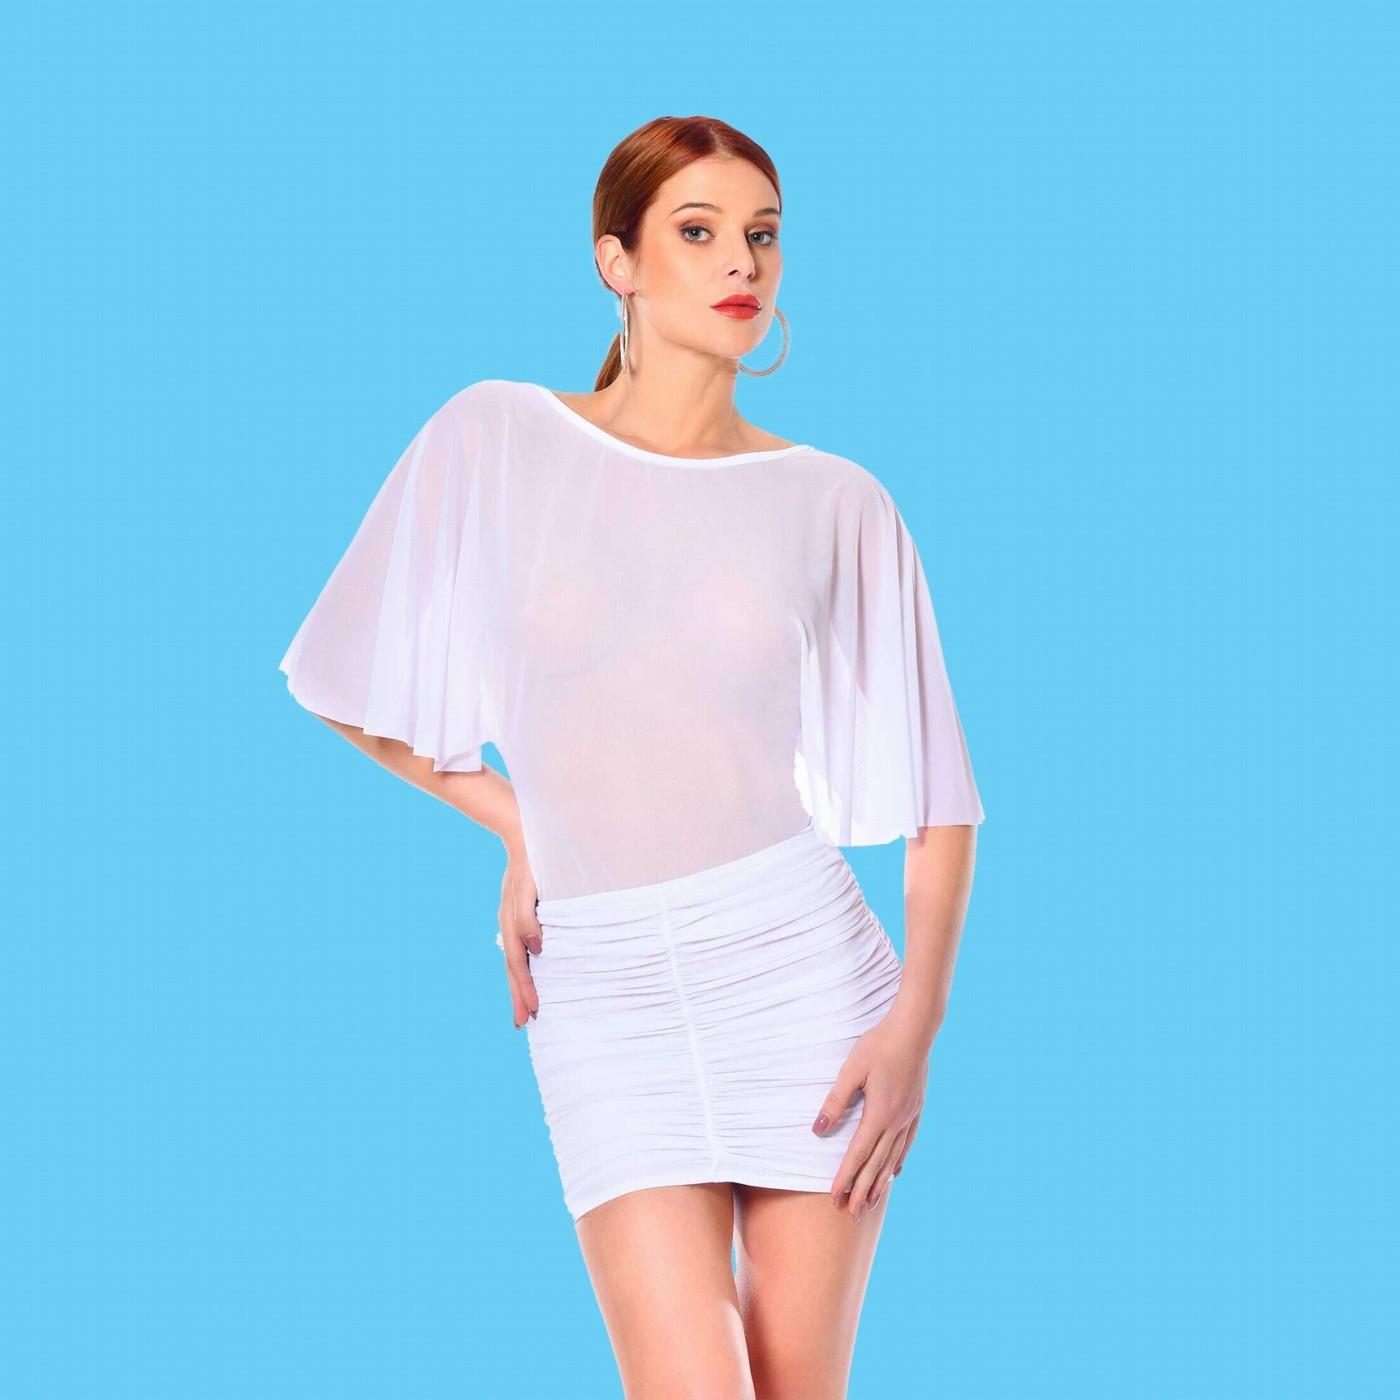 Turquoise, jupe sexy résille blanche - Patrice Catanzaro Site Officiel